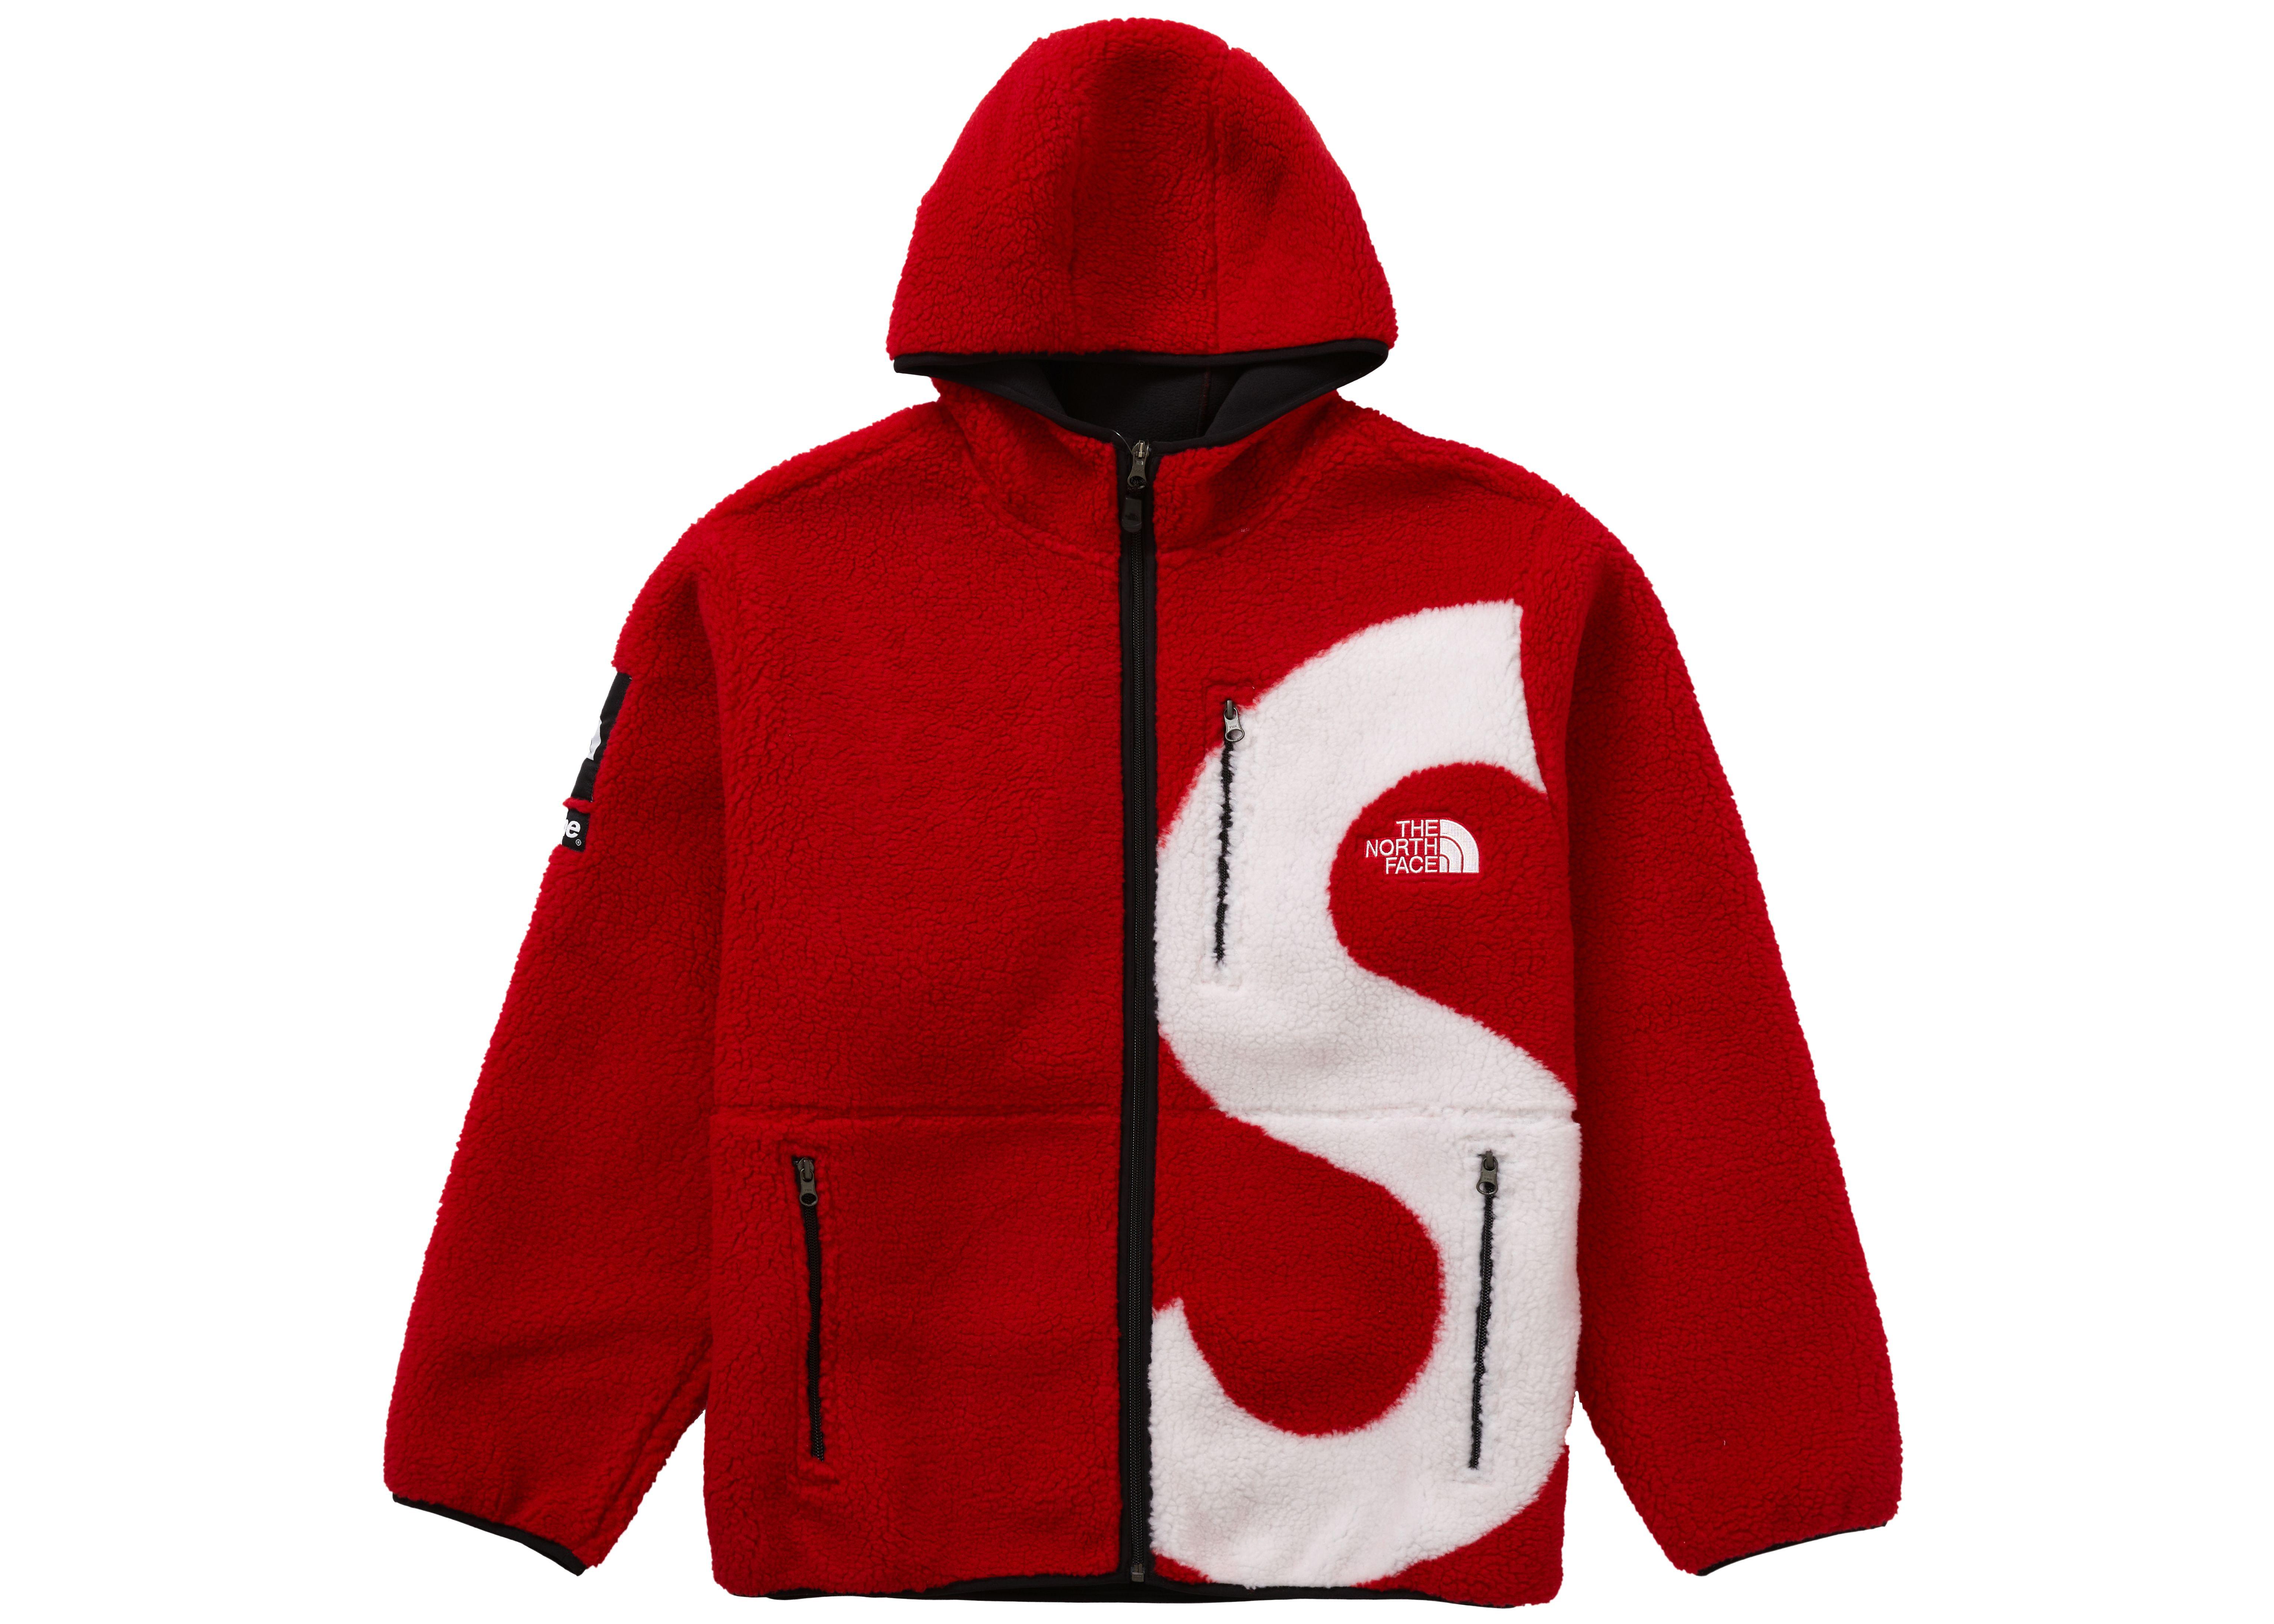 Supreme The North Face S Logo Fleece Jacket Red In 2021 Jackets Fleece Jacket Red Jacket [ 4380 x 6132 Pixel ]